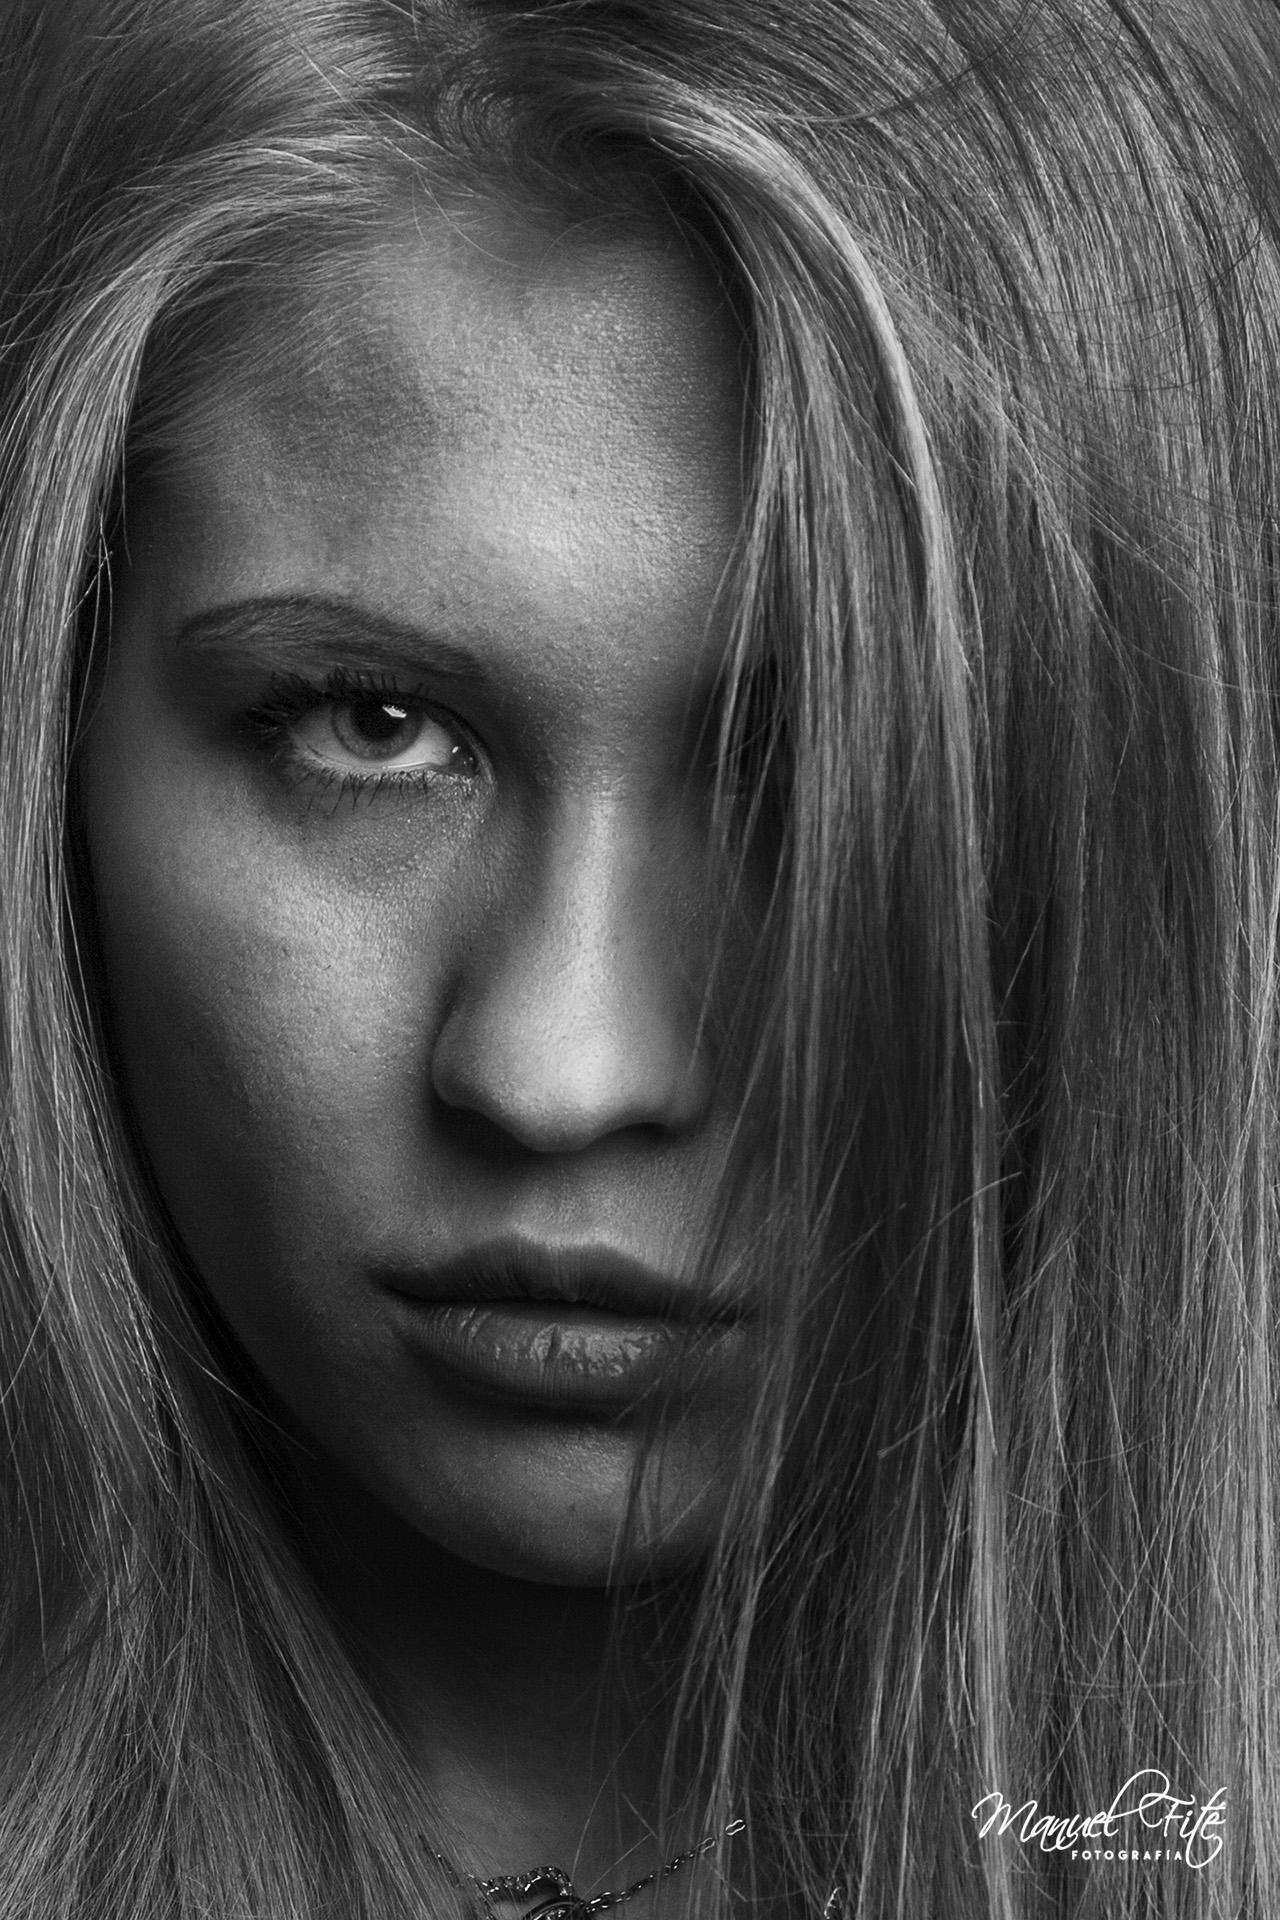 retratos - Manuel Fité, Fotografía